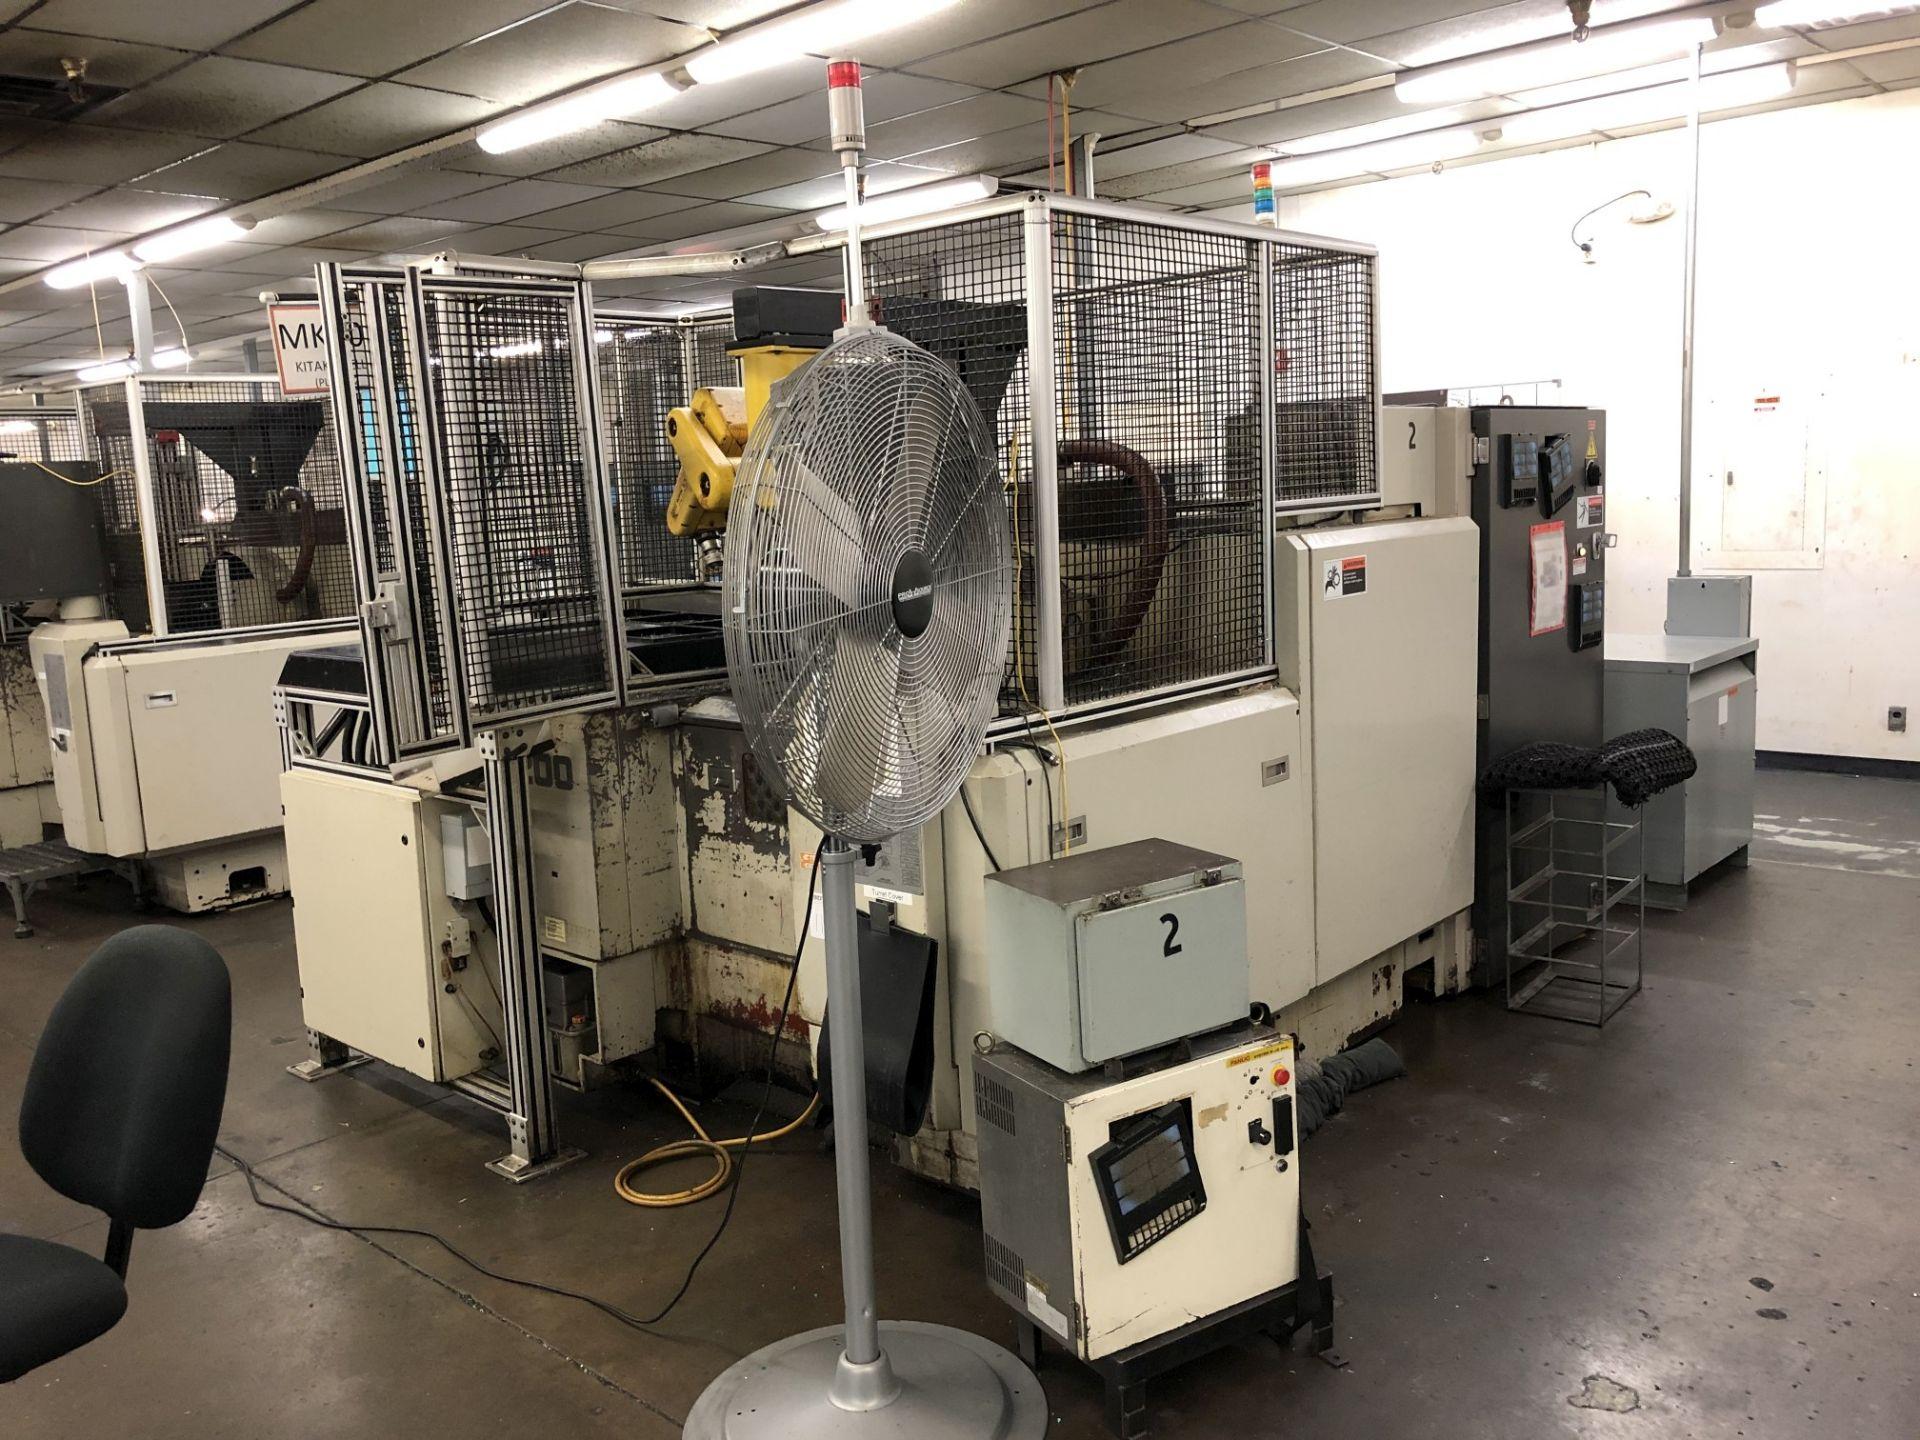 1999 Kitako MT4-200 Multi-Spindle CNC Turning Mill - Image 8 of 17